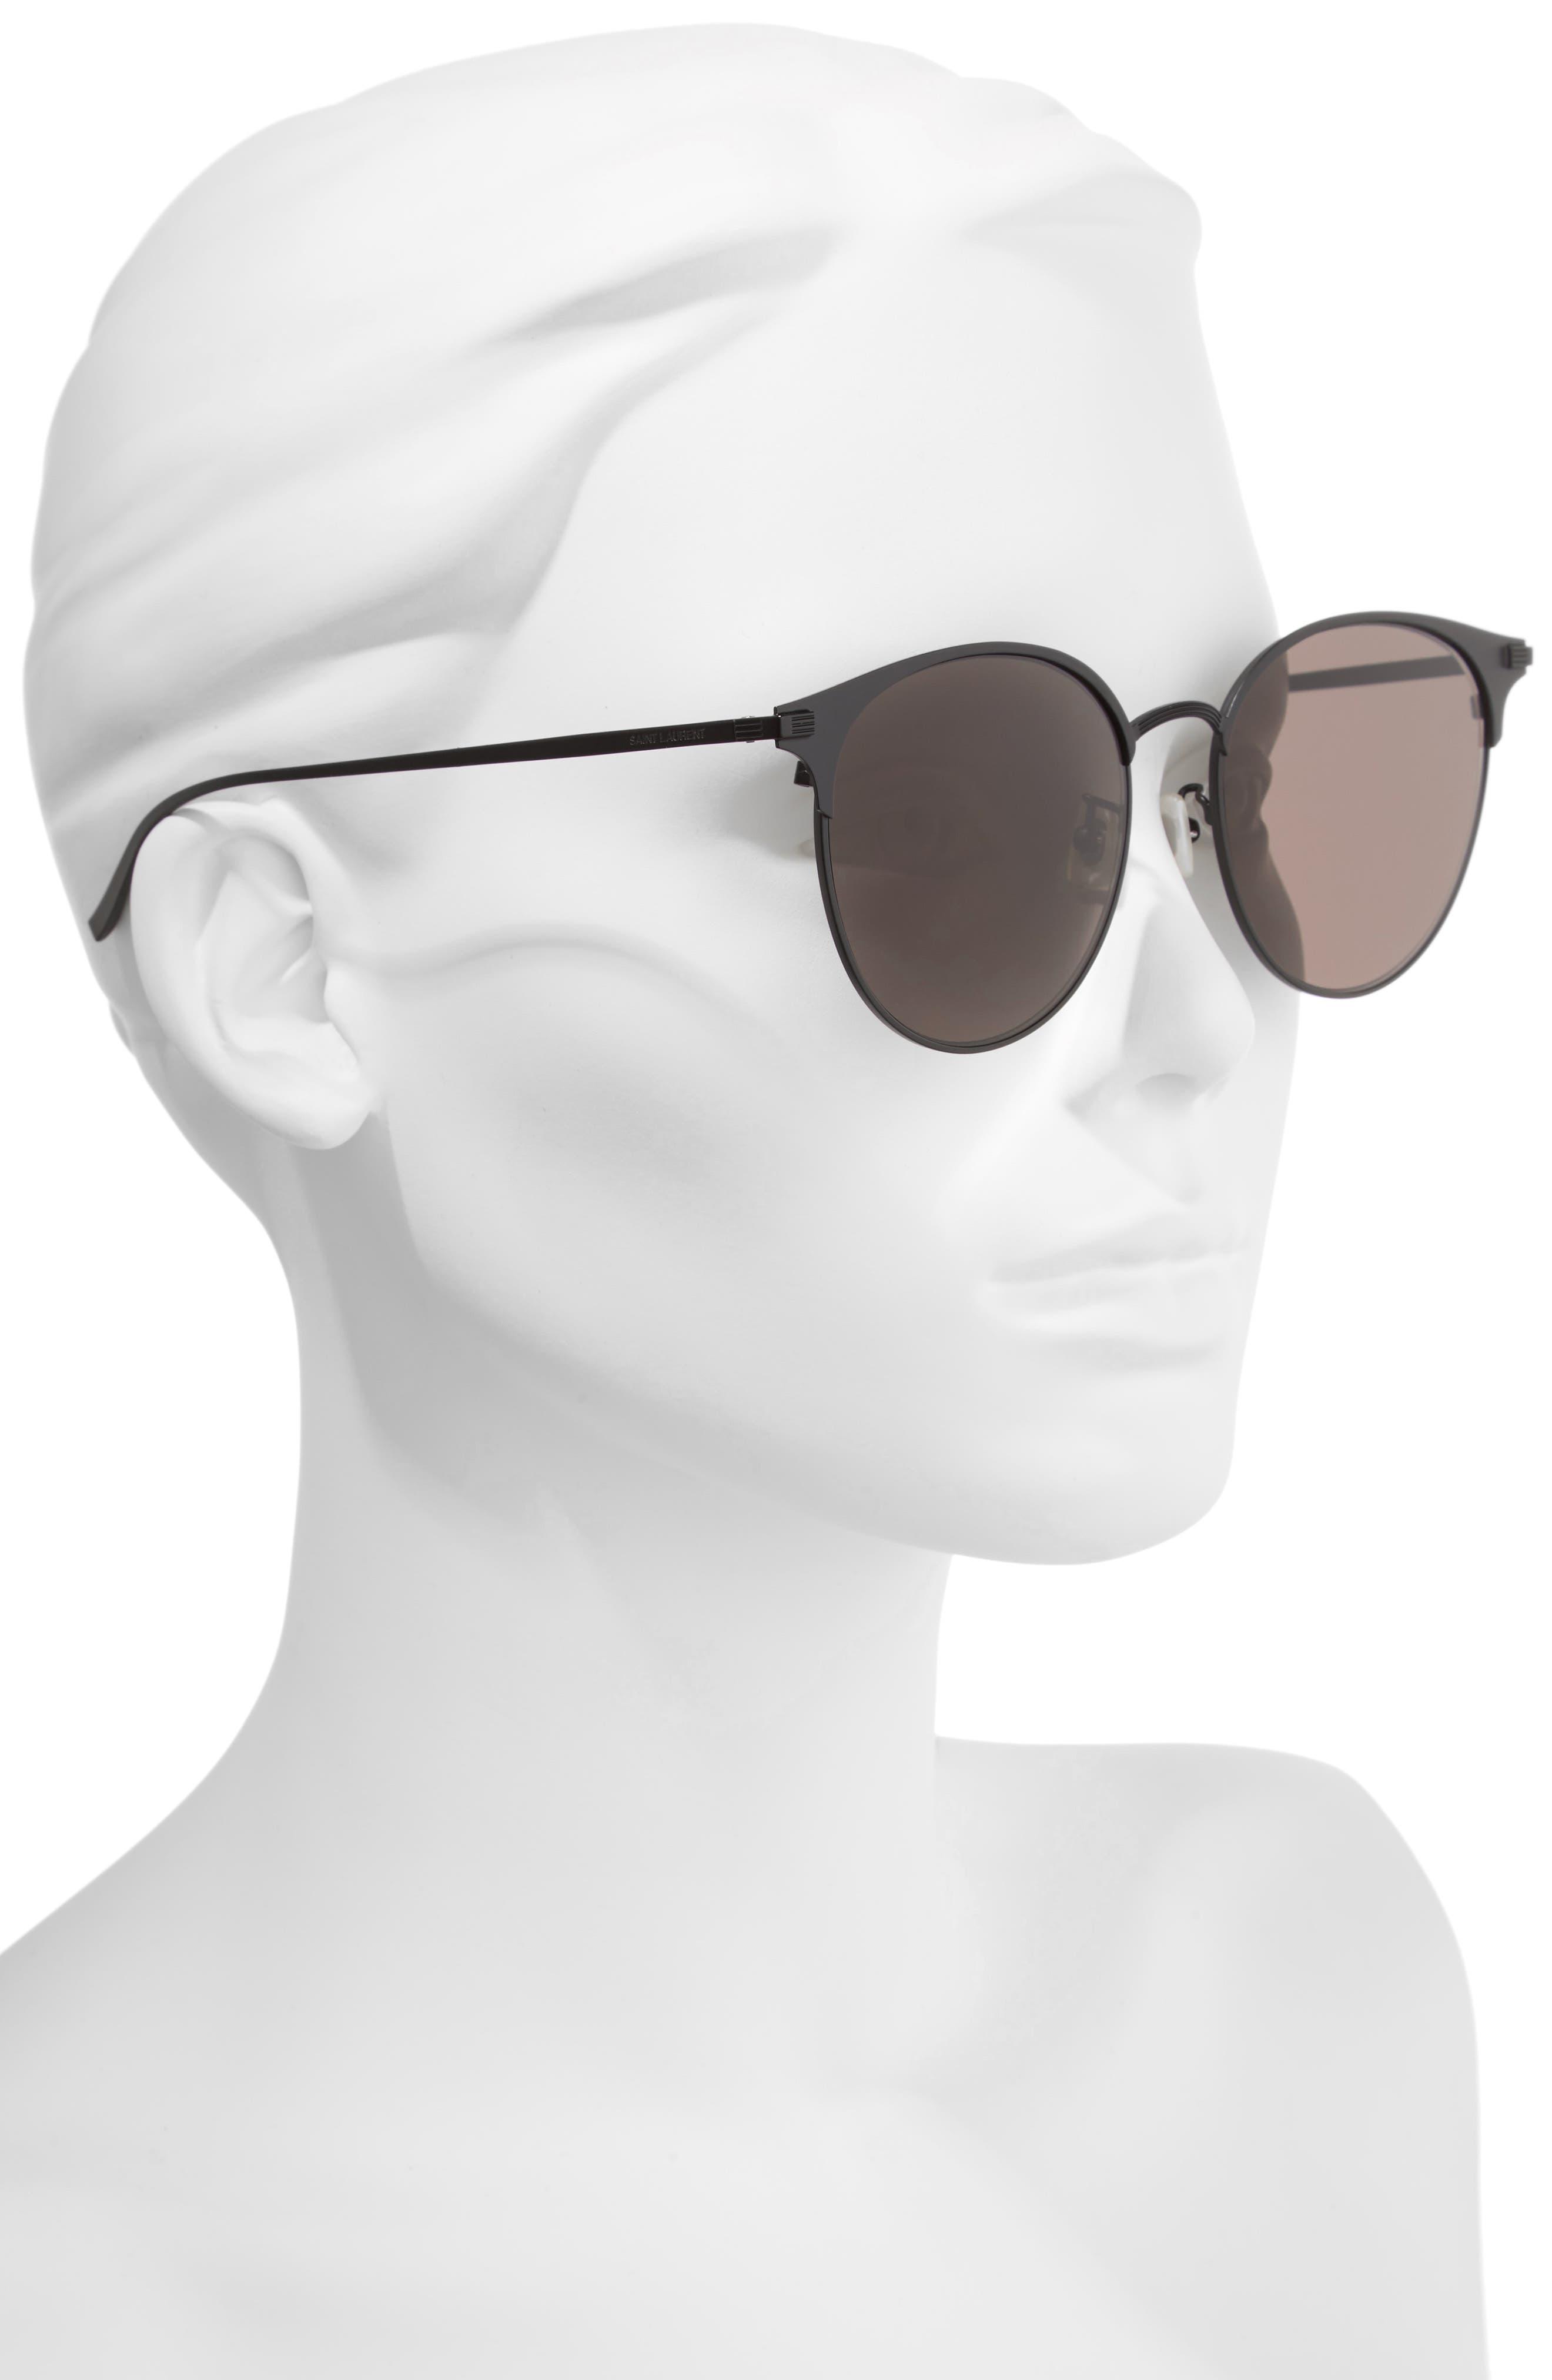 57mm Sunglasses,                             Alternate thumbnail 2, color,                             BLACK